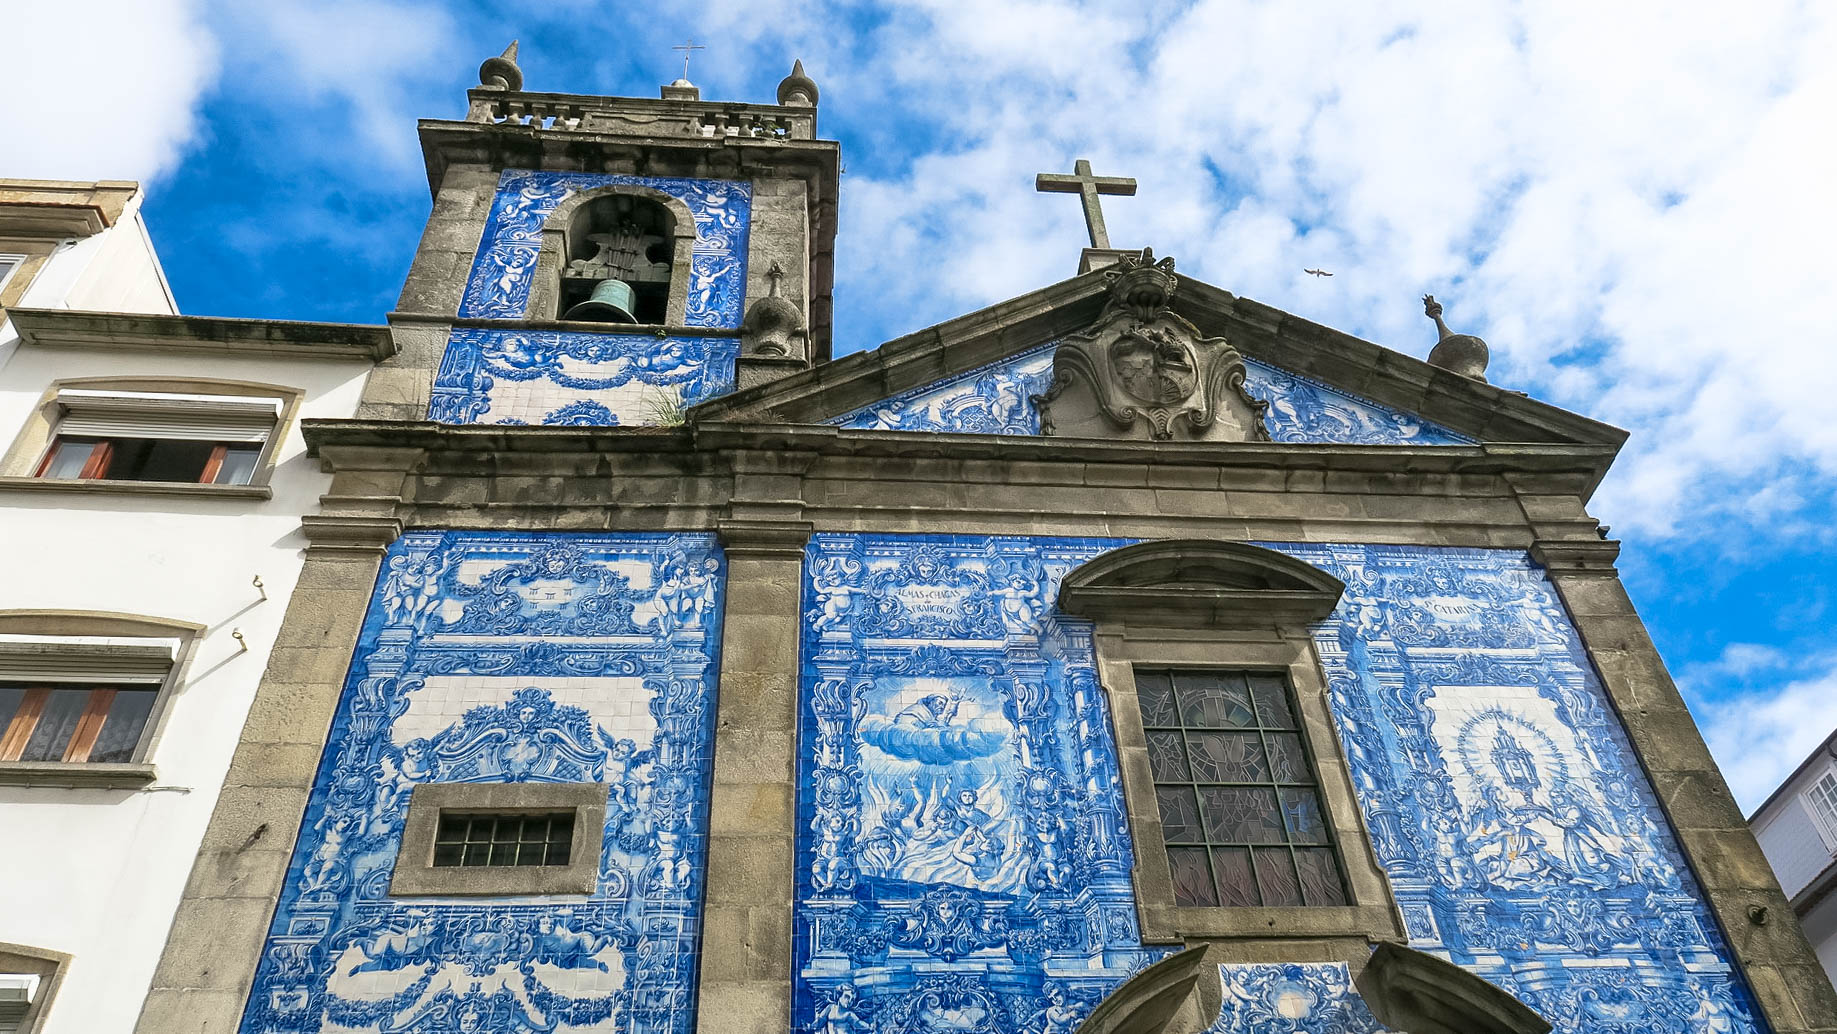 azulejo kápolna kék templom